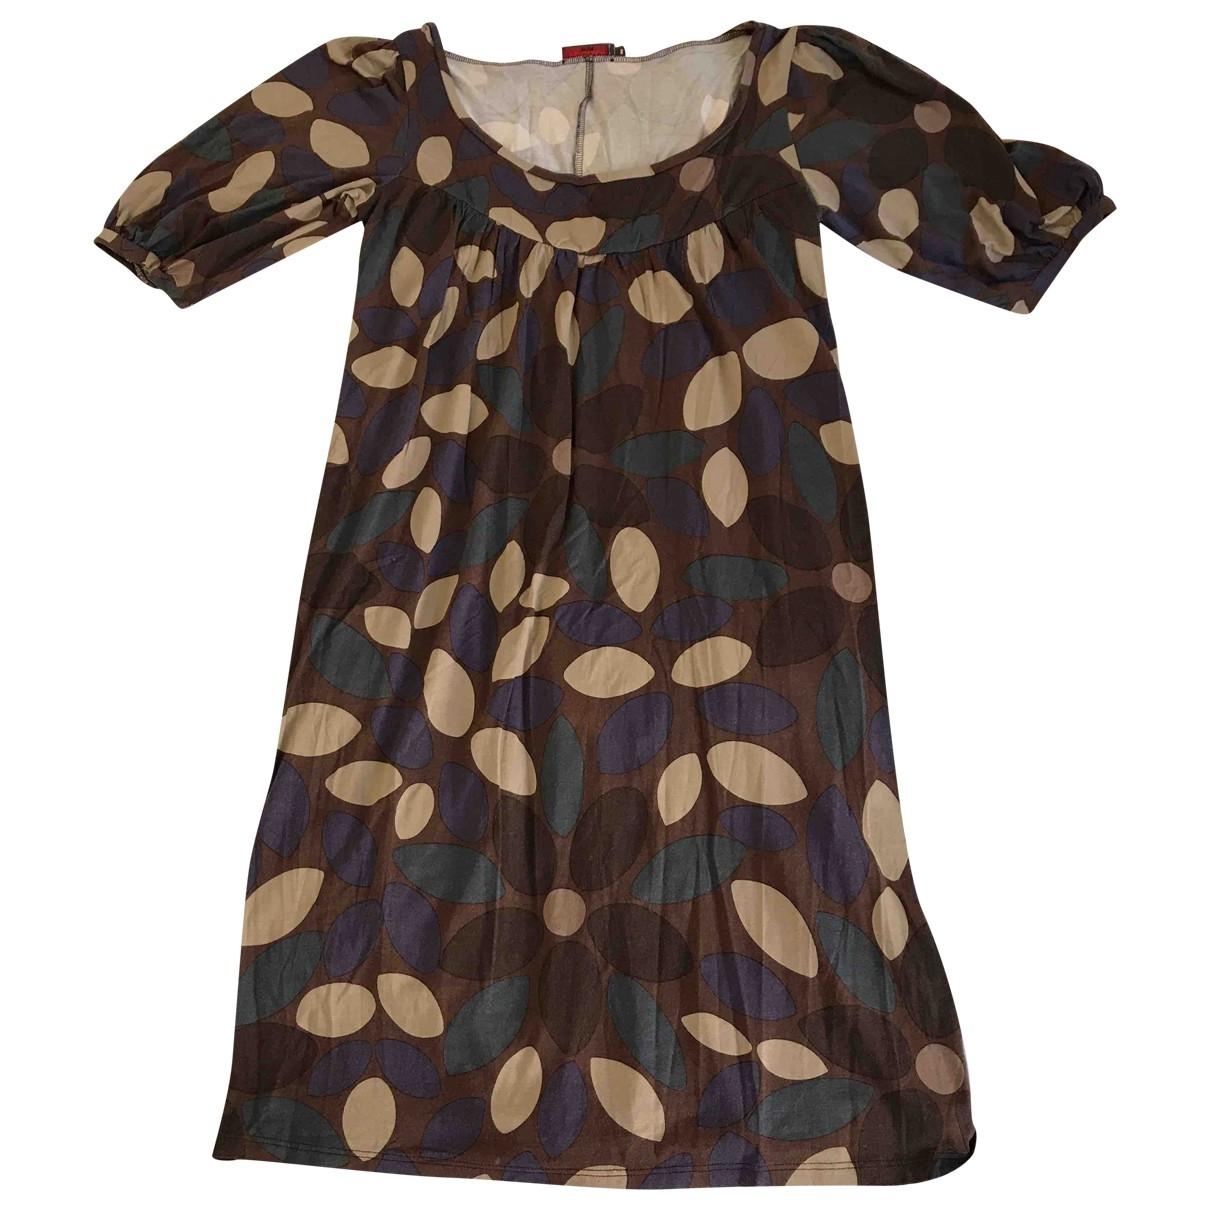 Max & Co \N Multicolour dress for Women S International